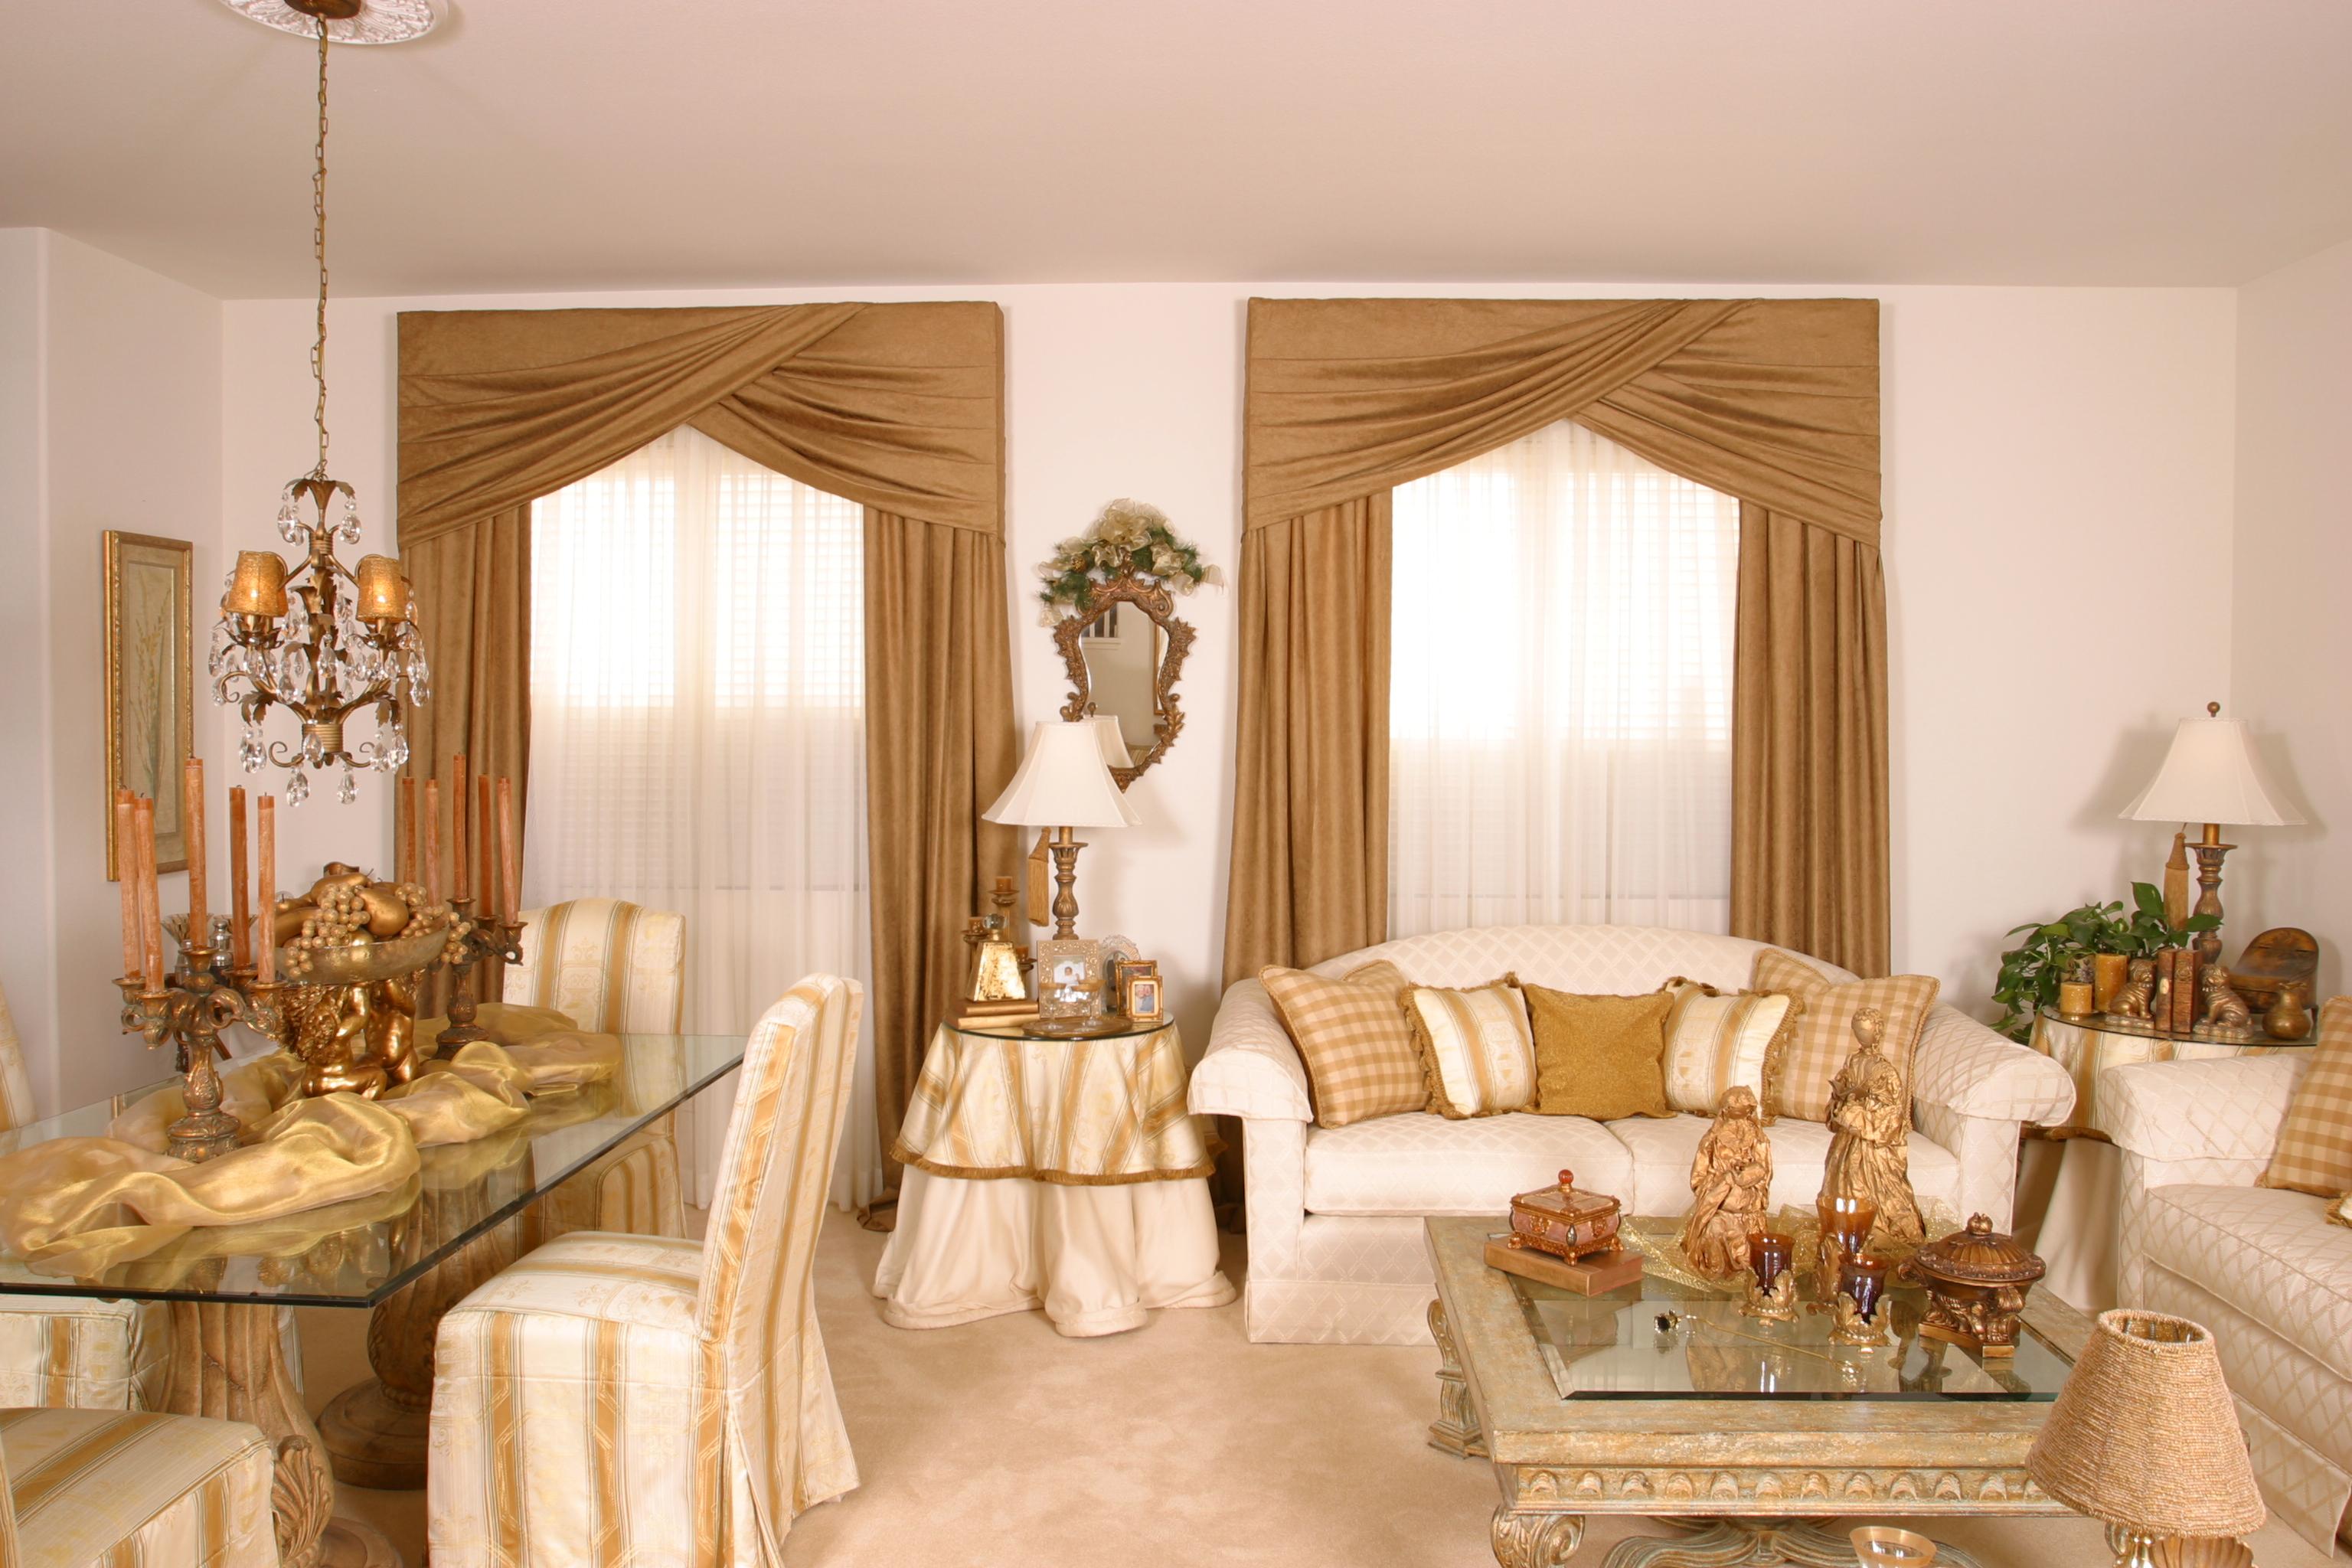 Custom Upholstery and Draperies